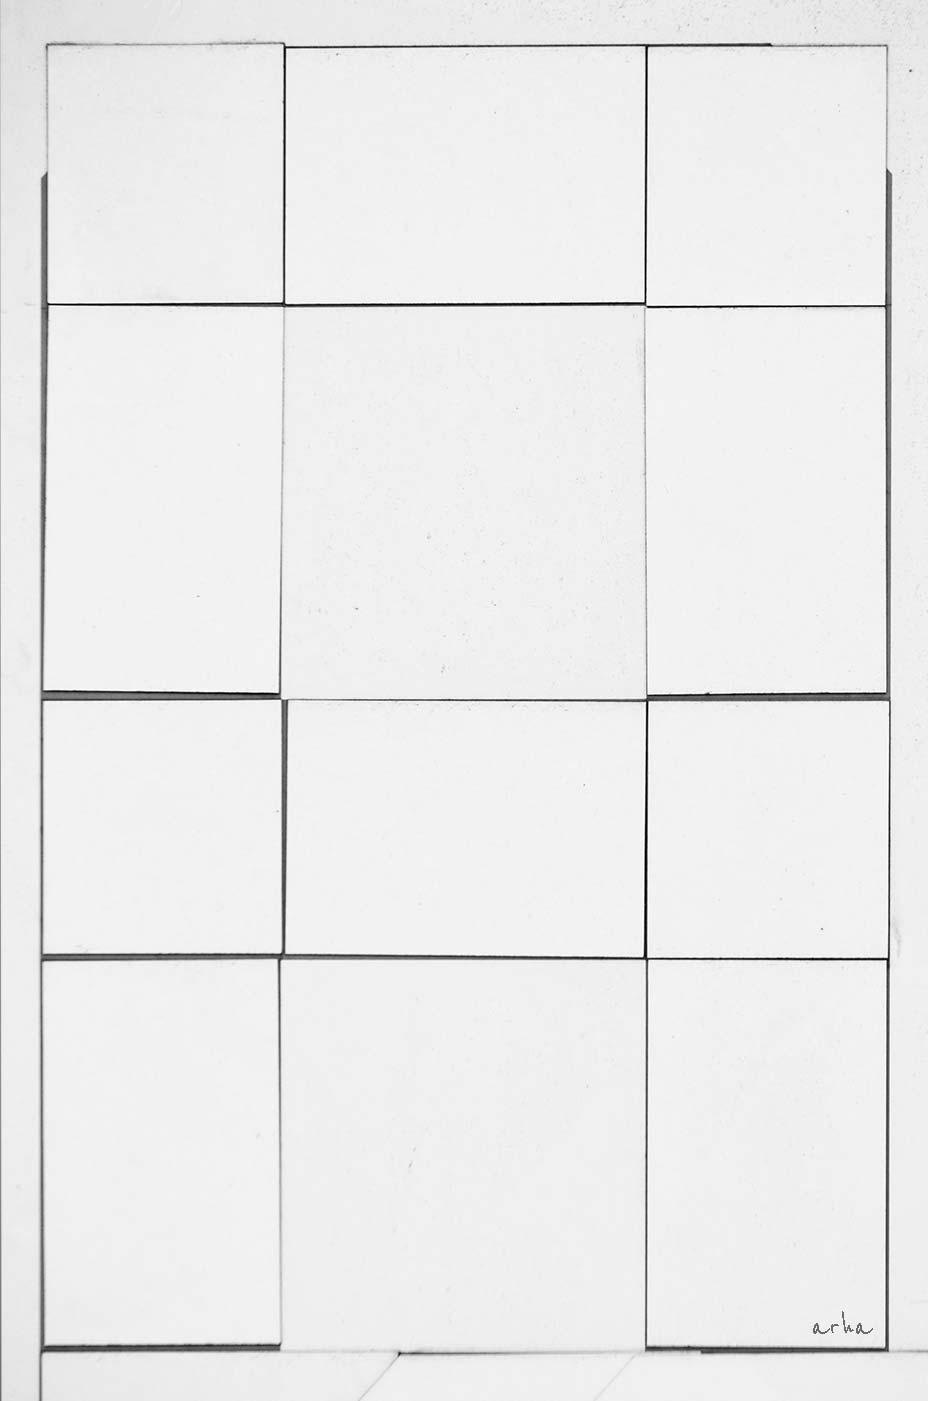 The-price-panel-of-a-gas-station-copyright-2012-arha-Tomomichi-Morifuji